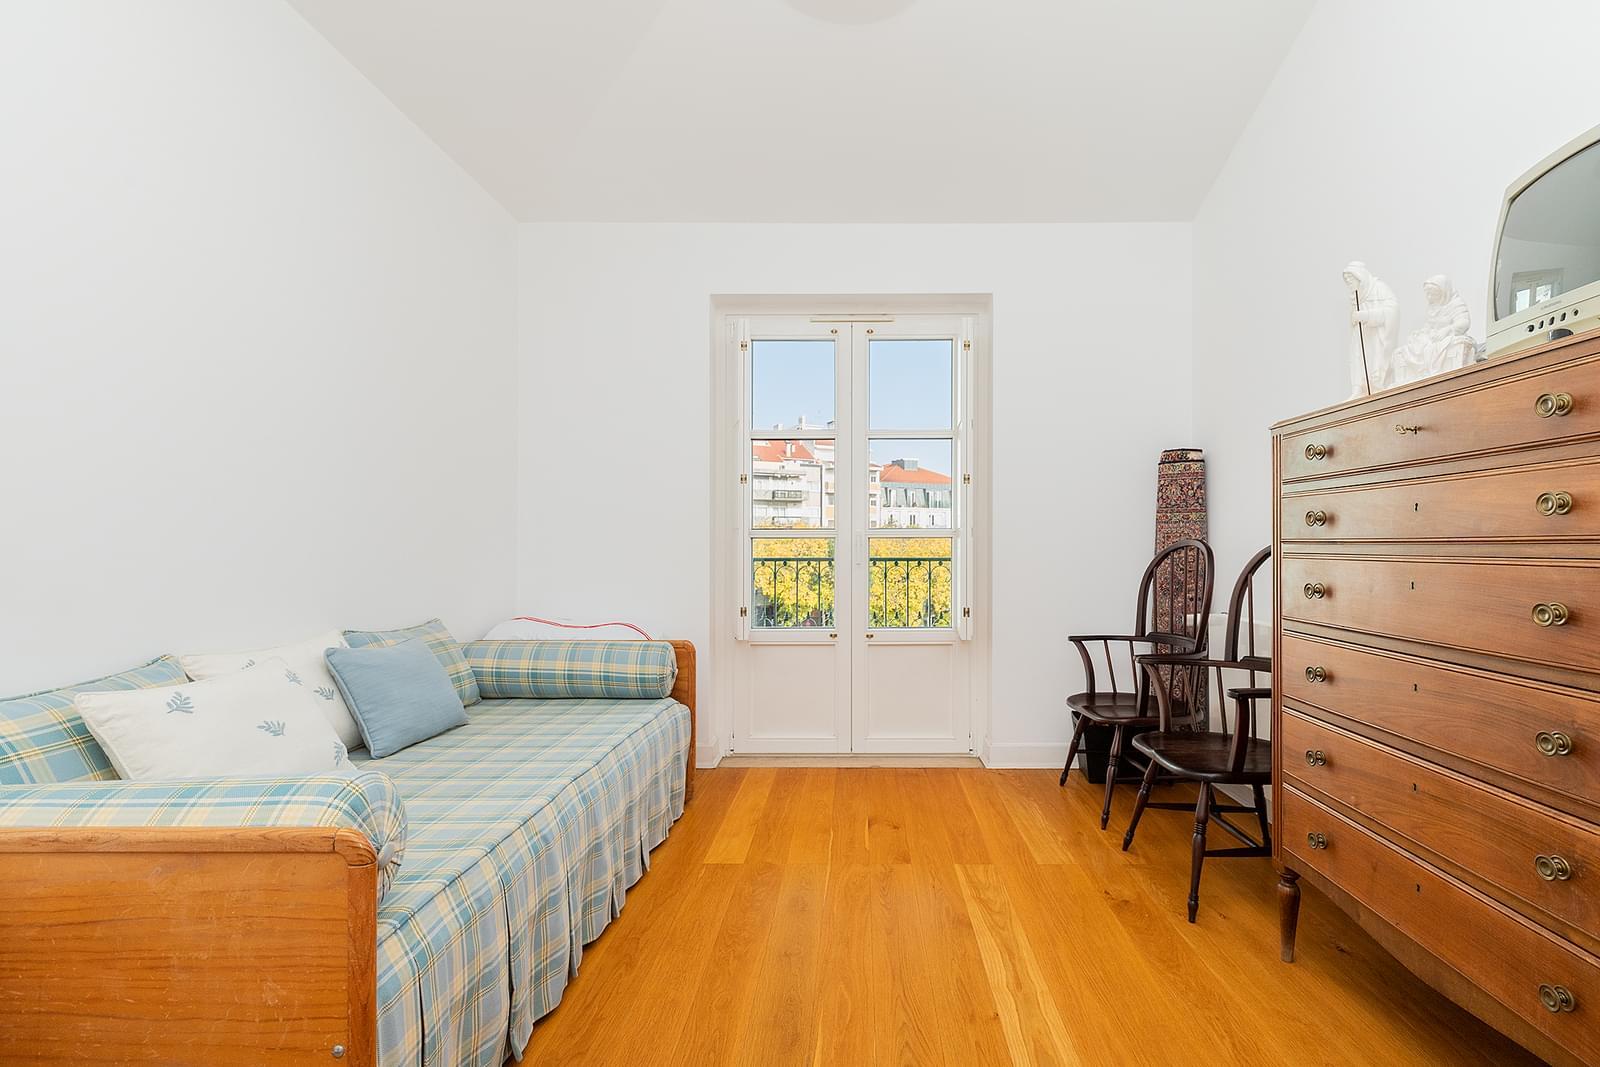 pf18618-apartamento-t4-1-lisboa-e20f5815-edb8-432e-b910-4b5ea966547a